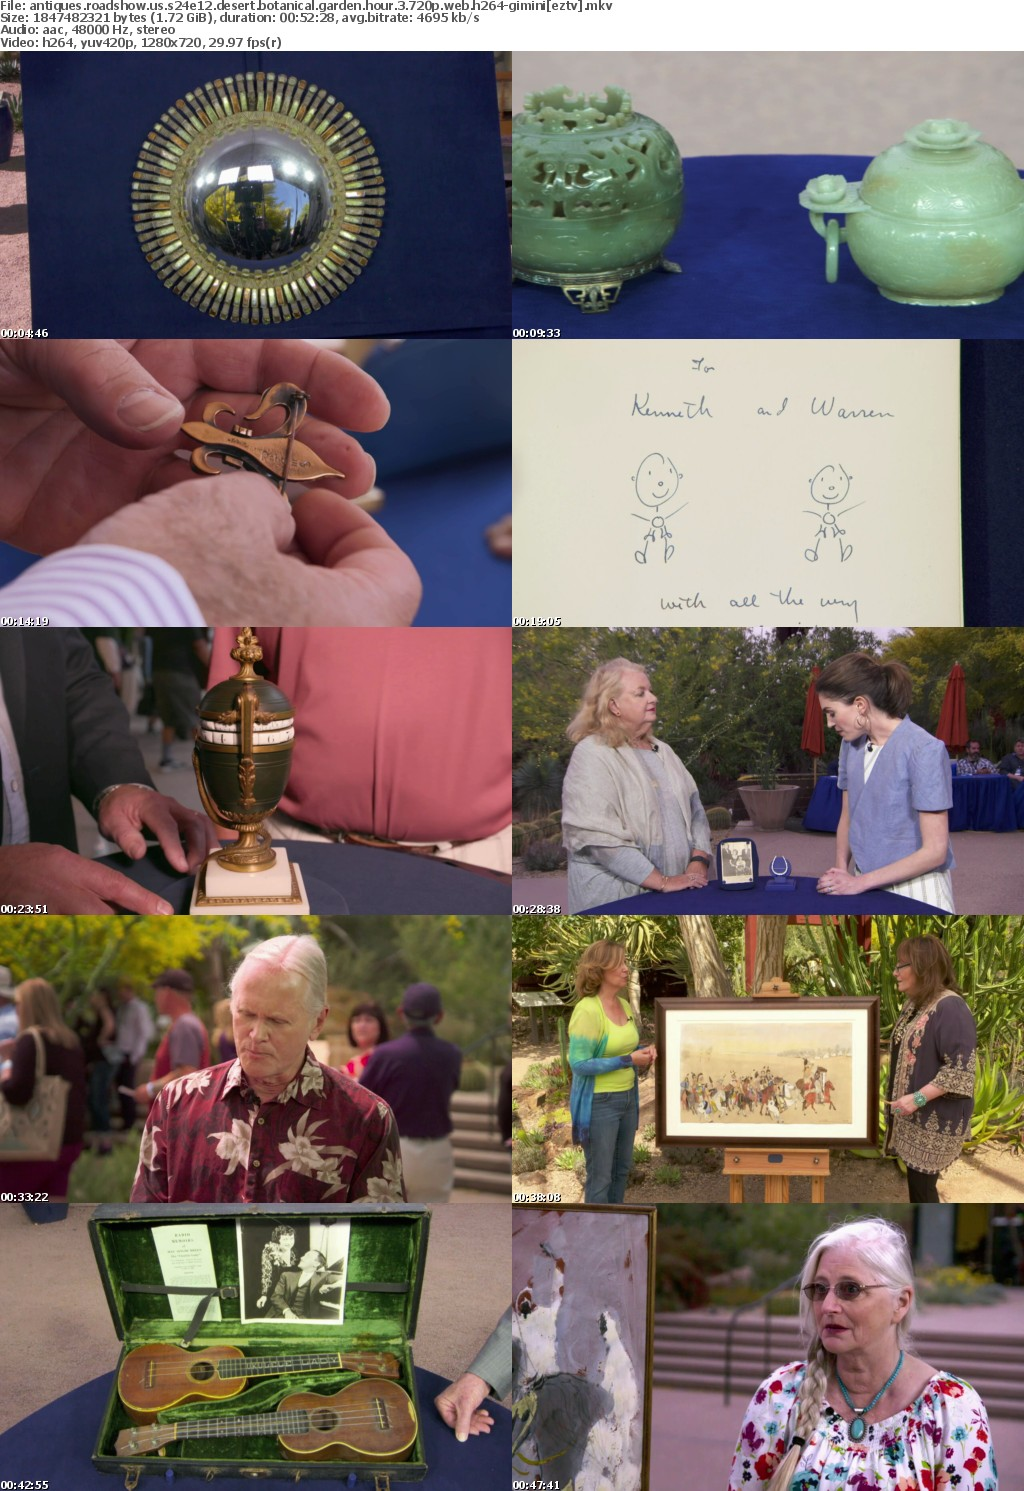 Antiques Roadshow US S24E12 Desert Botanical Garden Hour 3 720p WEB H264-GIMINI